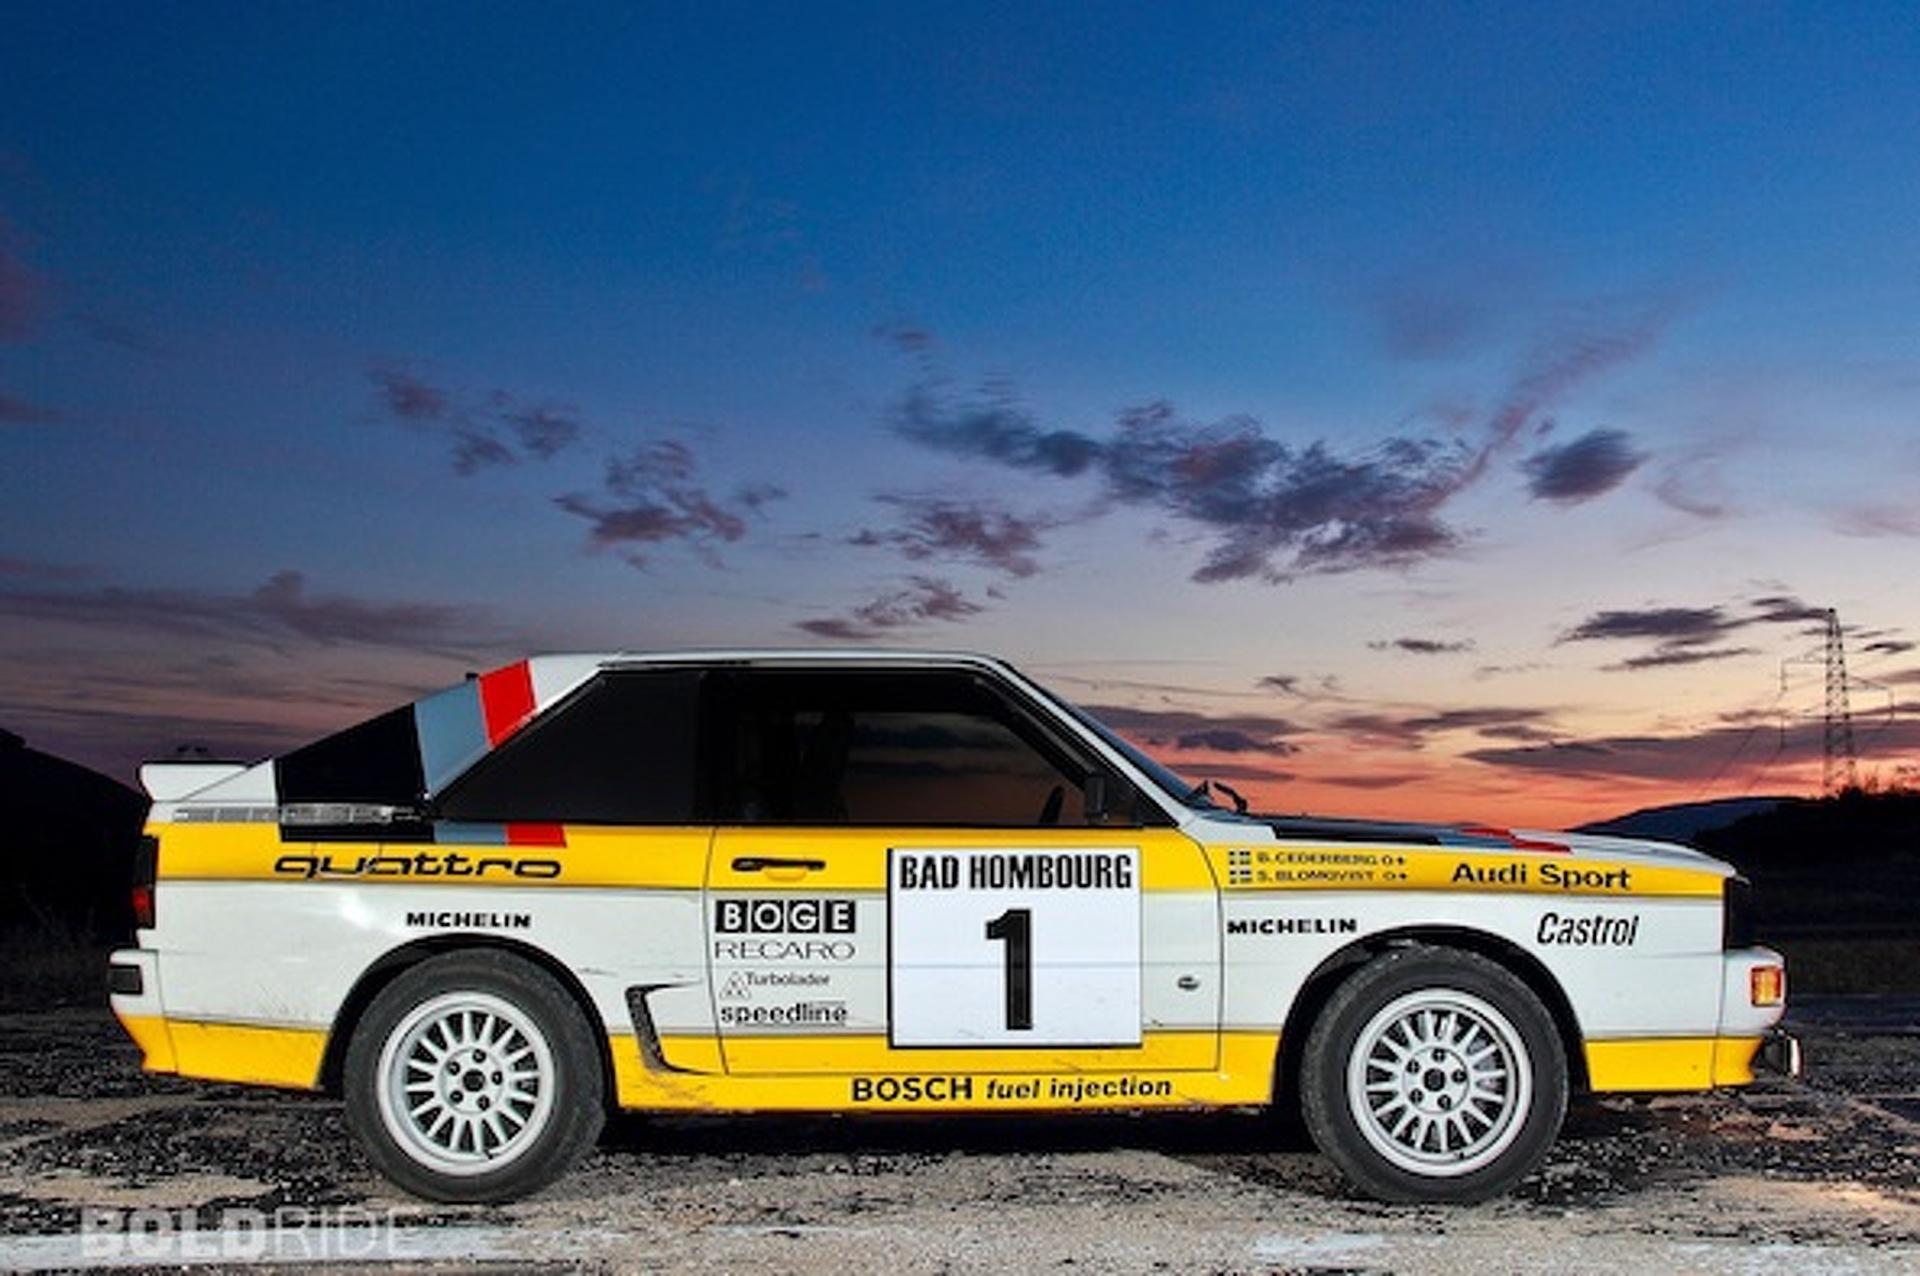 Wheels Wallpaper: 1985 Audi Quattro Group B Rally Car